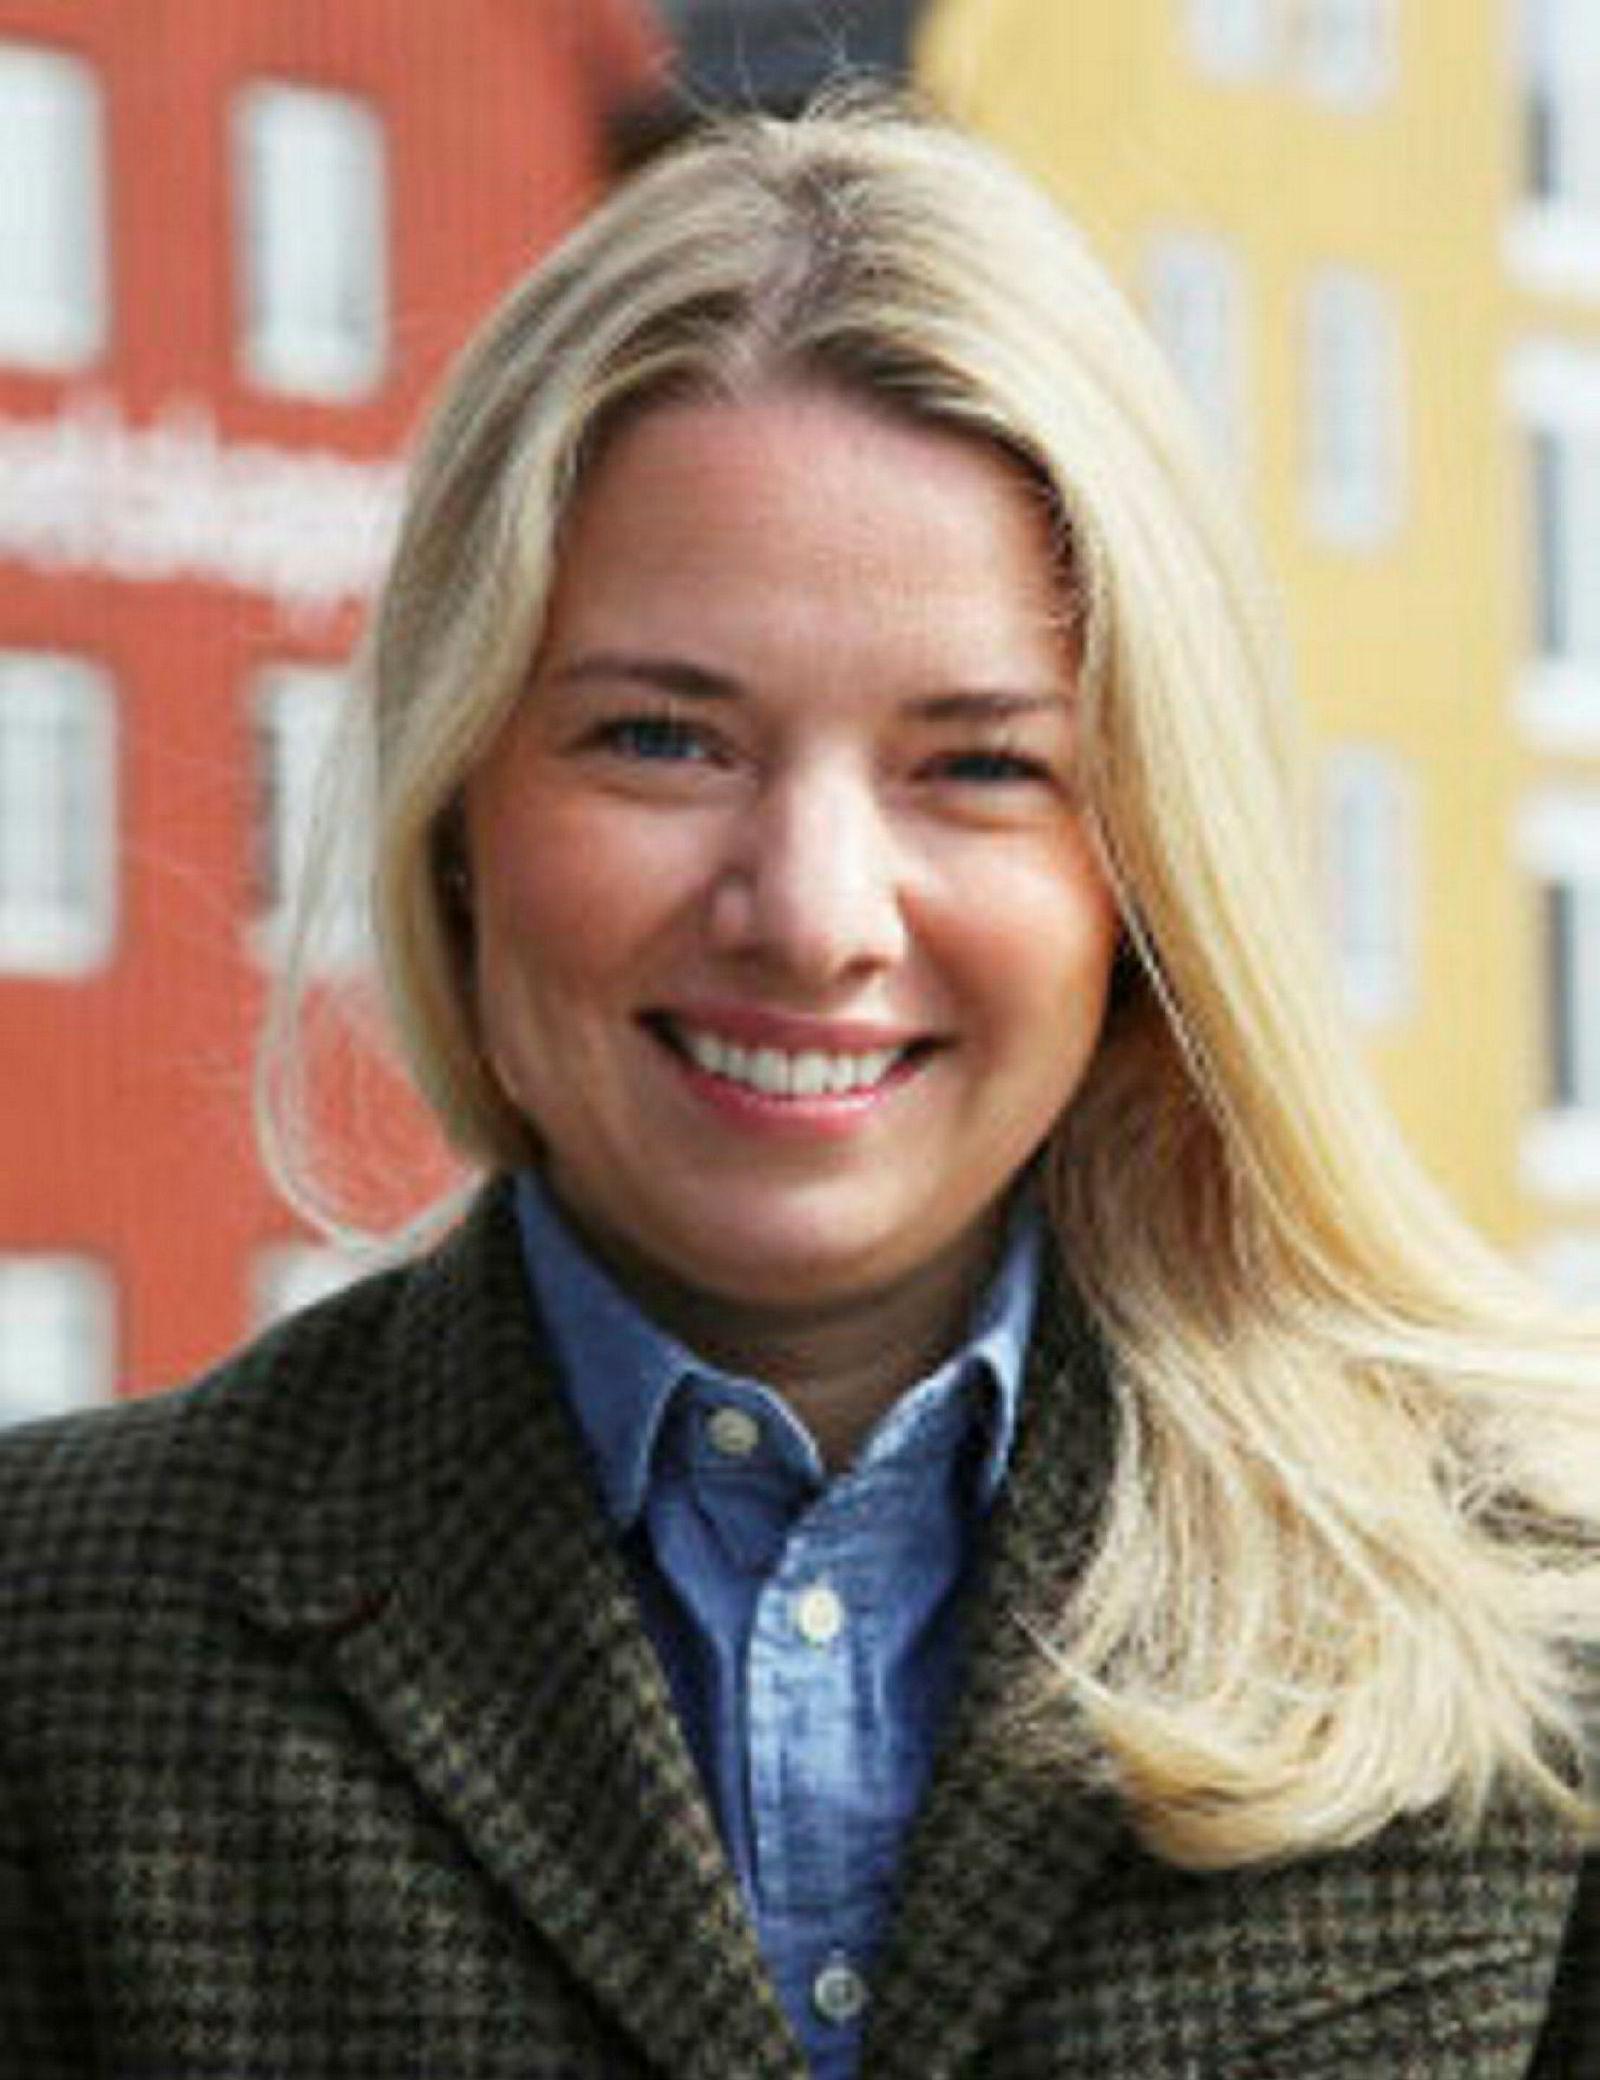 Victoria Braathen er eksportutsending i Kina for Norges sjømatråd.